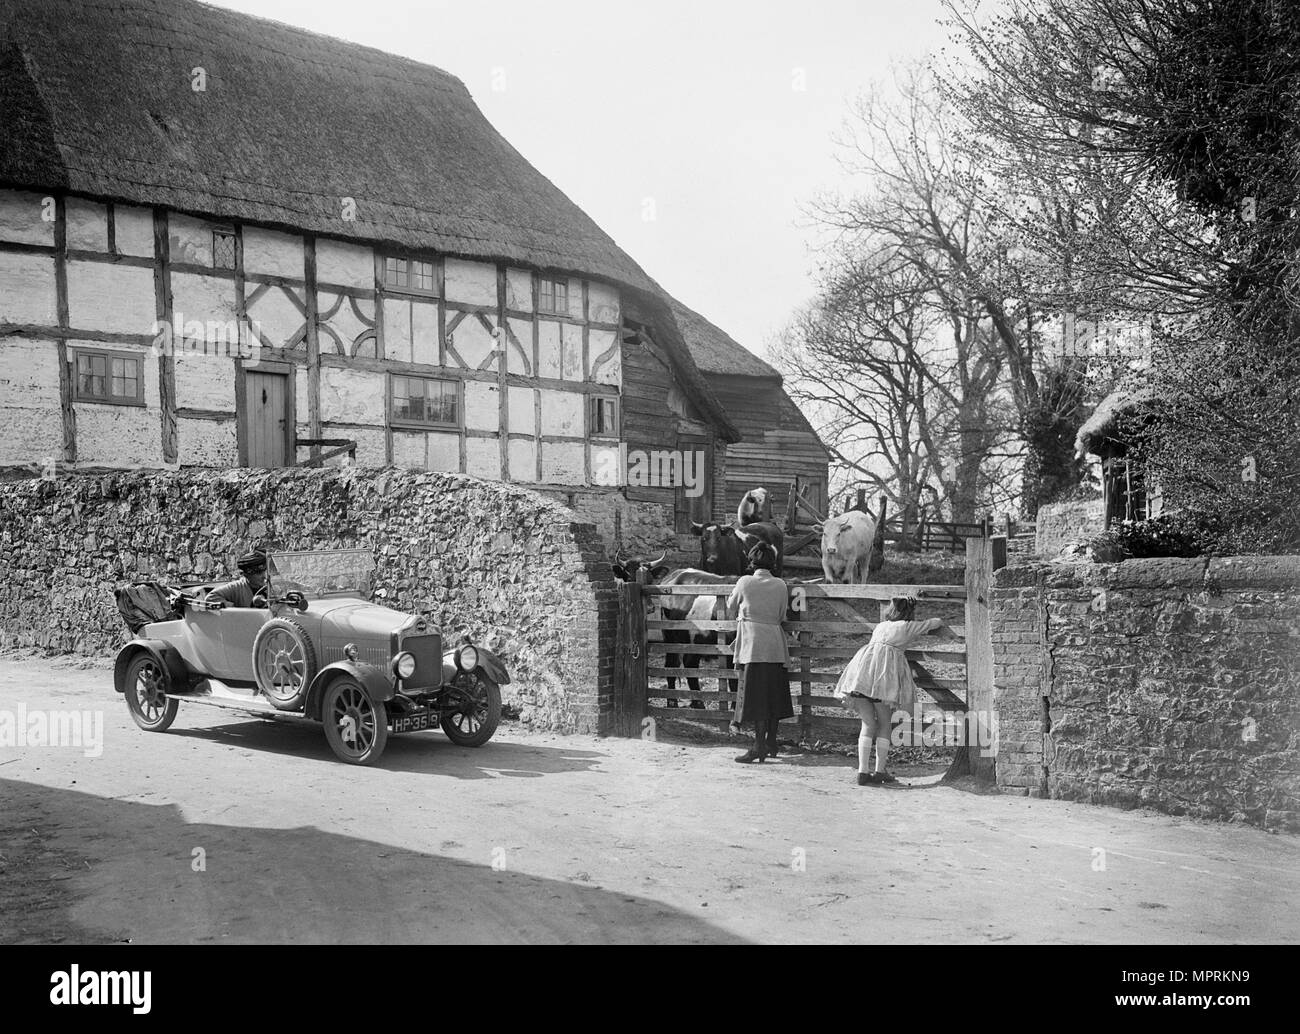 Calcott open tourer, Wantage, Oxfordshire, c1920s. Artist: Bill Brunell. - Stock Image